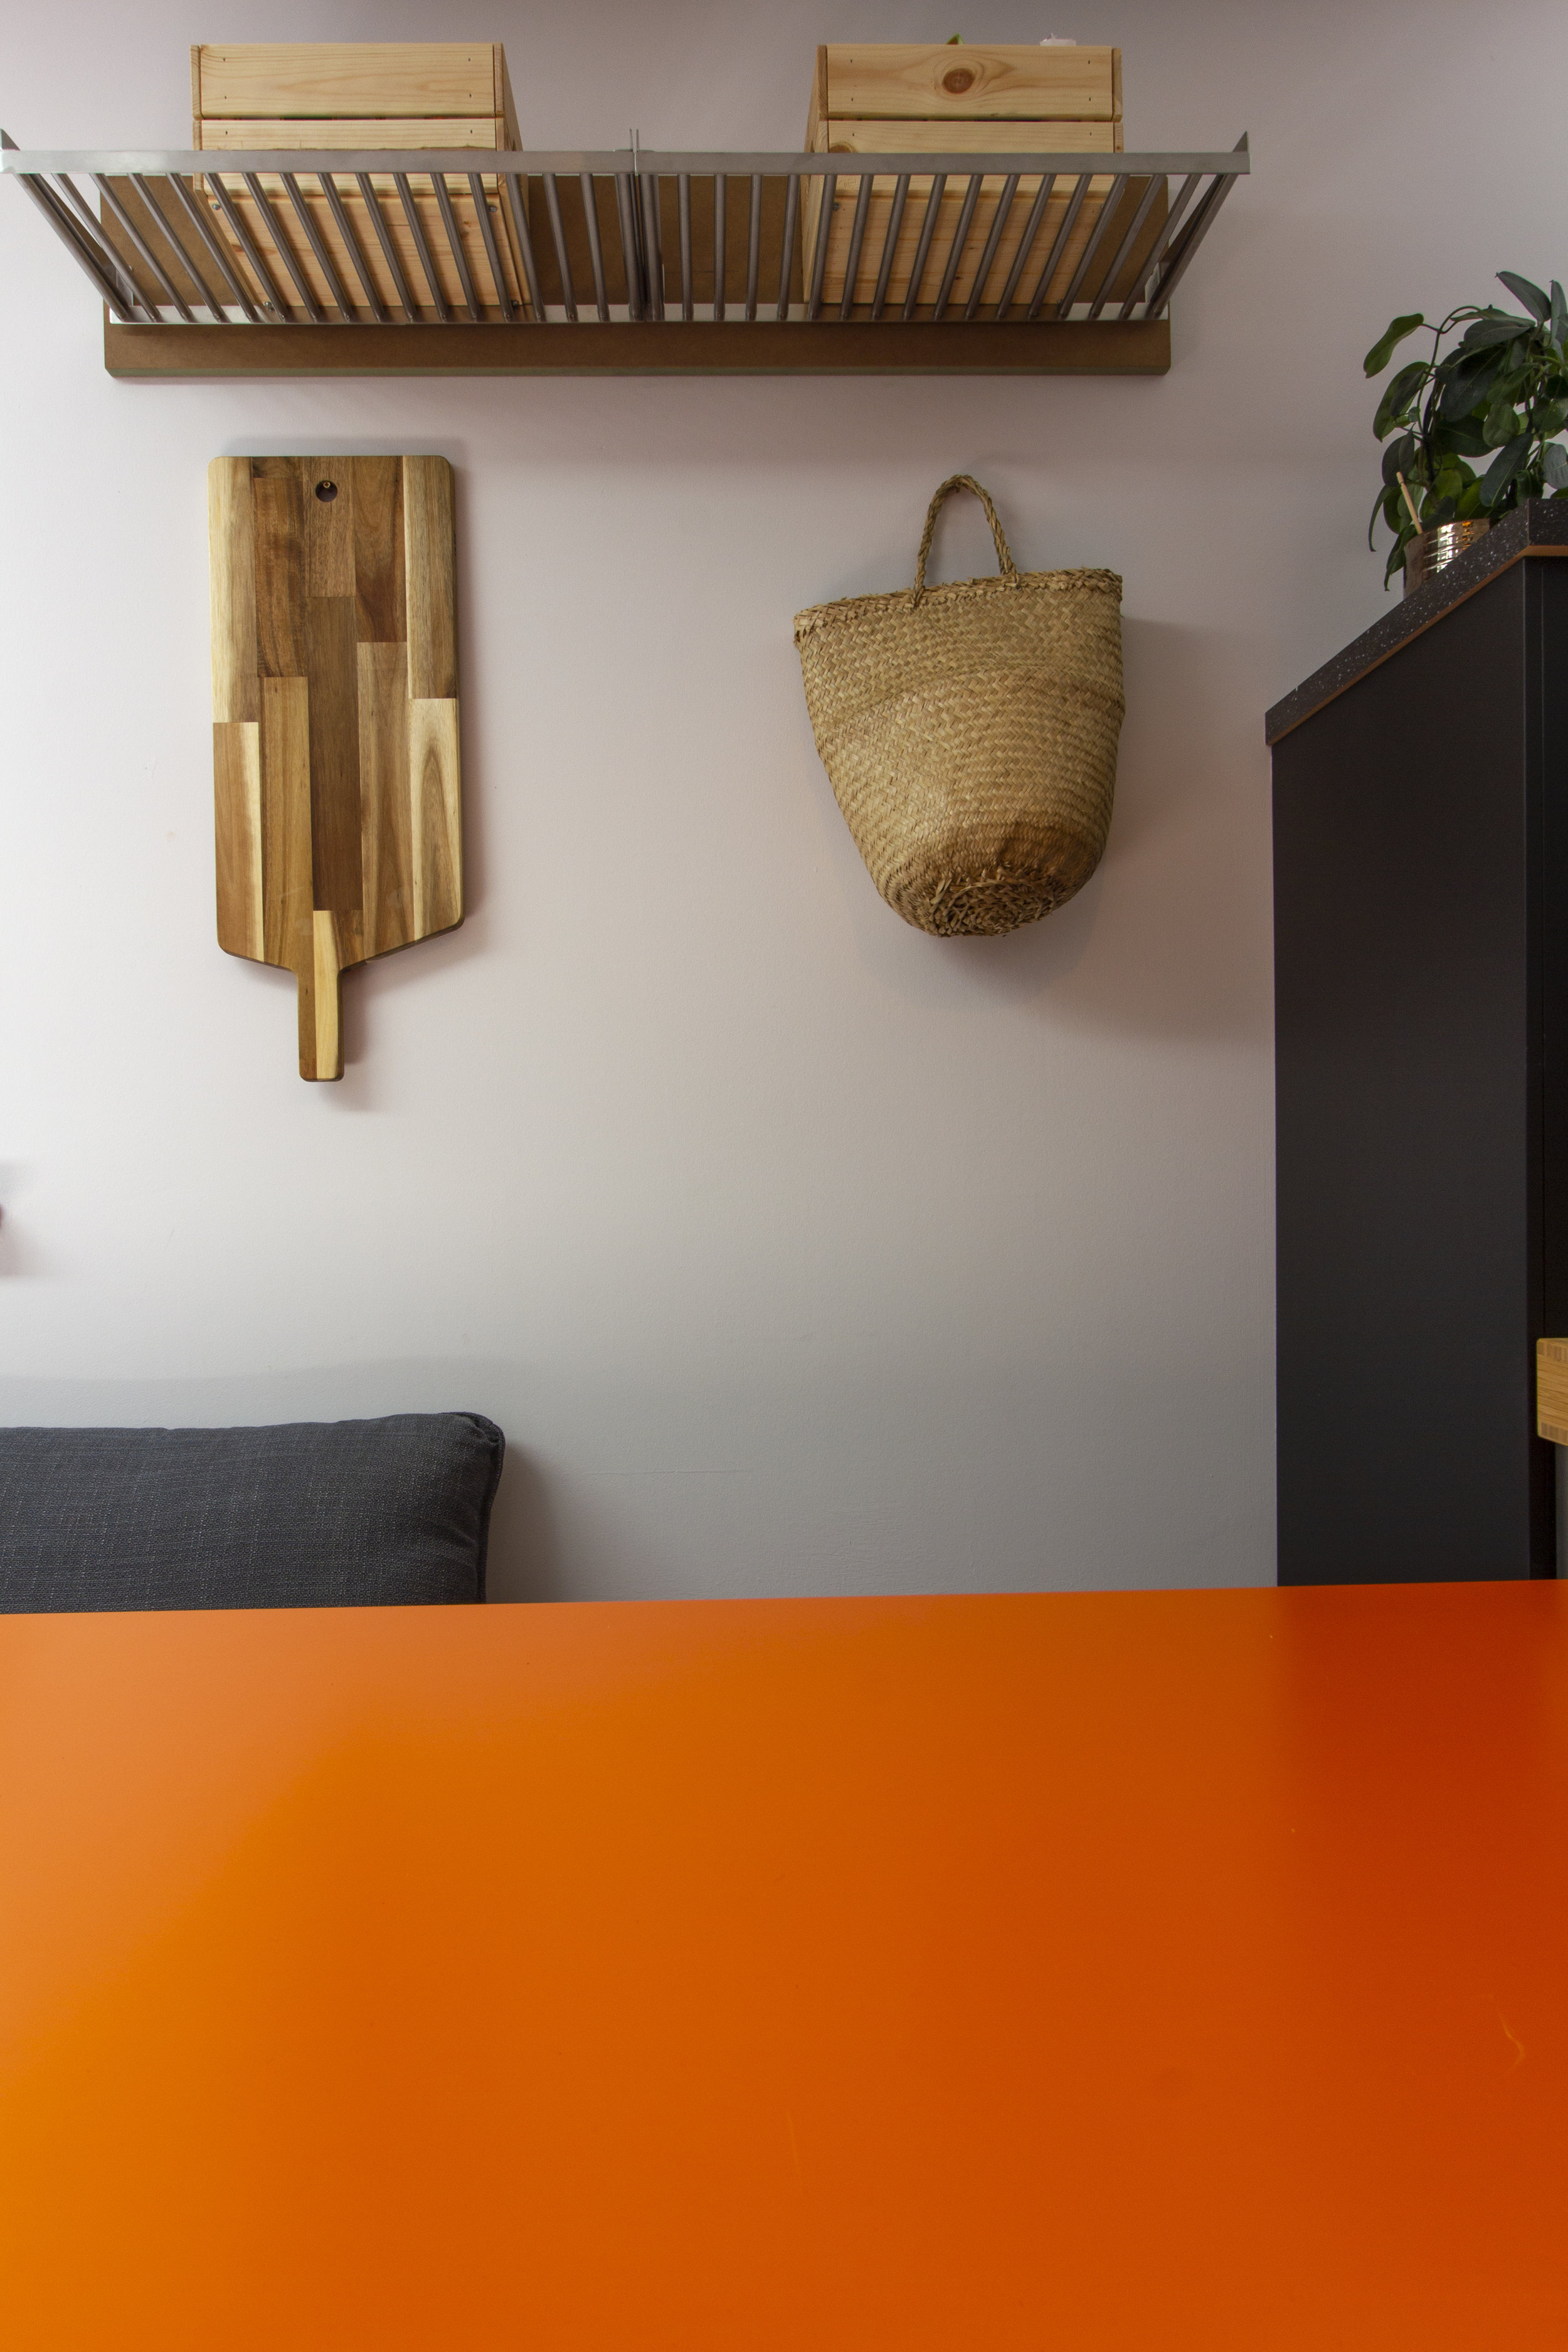 HR - Dublin 1 - After - Living Room Kitchen 24.jpg